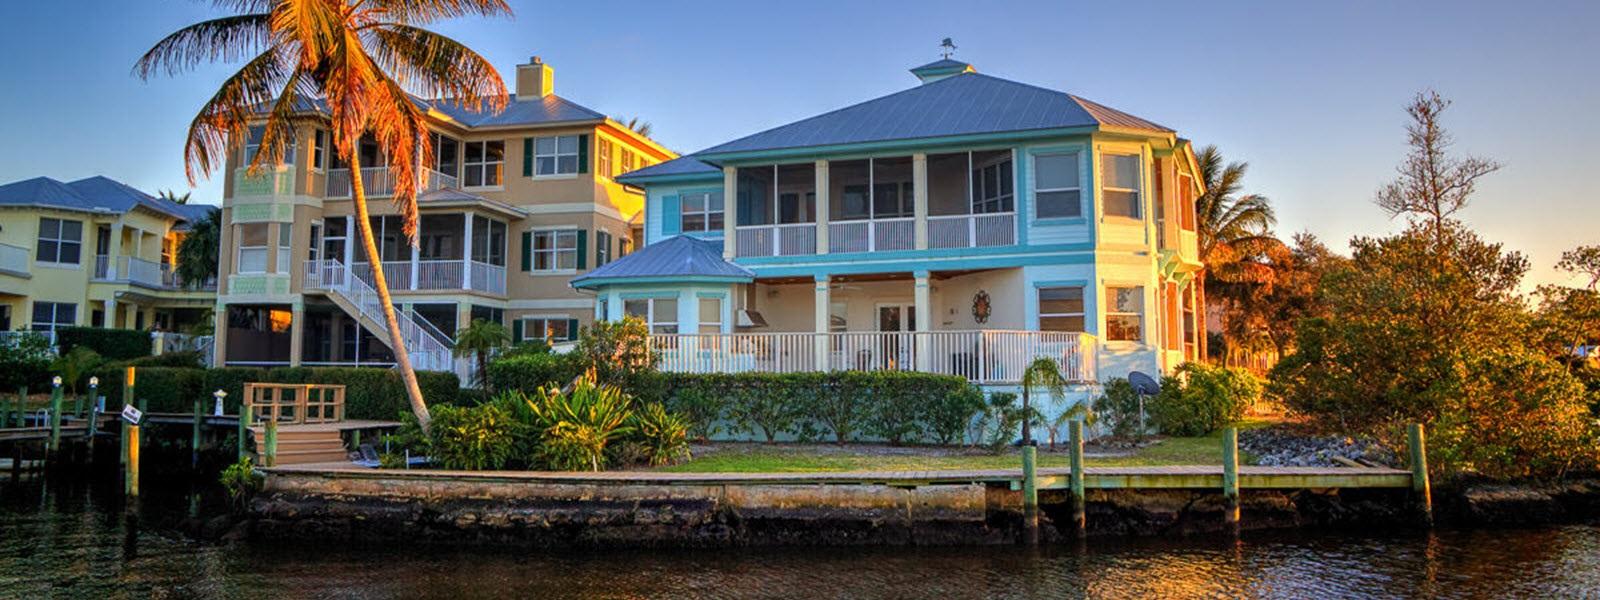 Downtown Stuart Real Estate Real Estate Listings